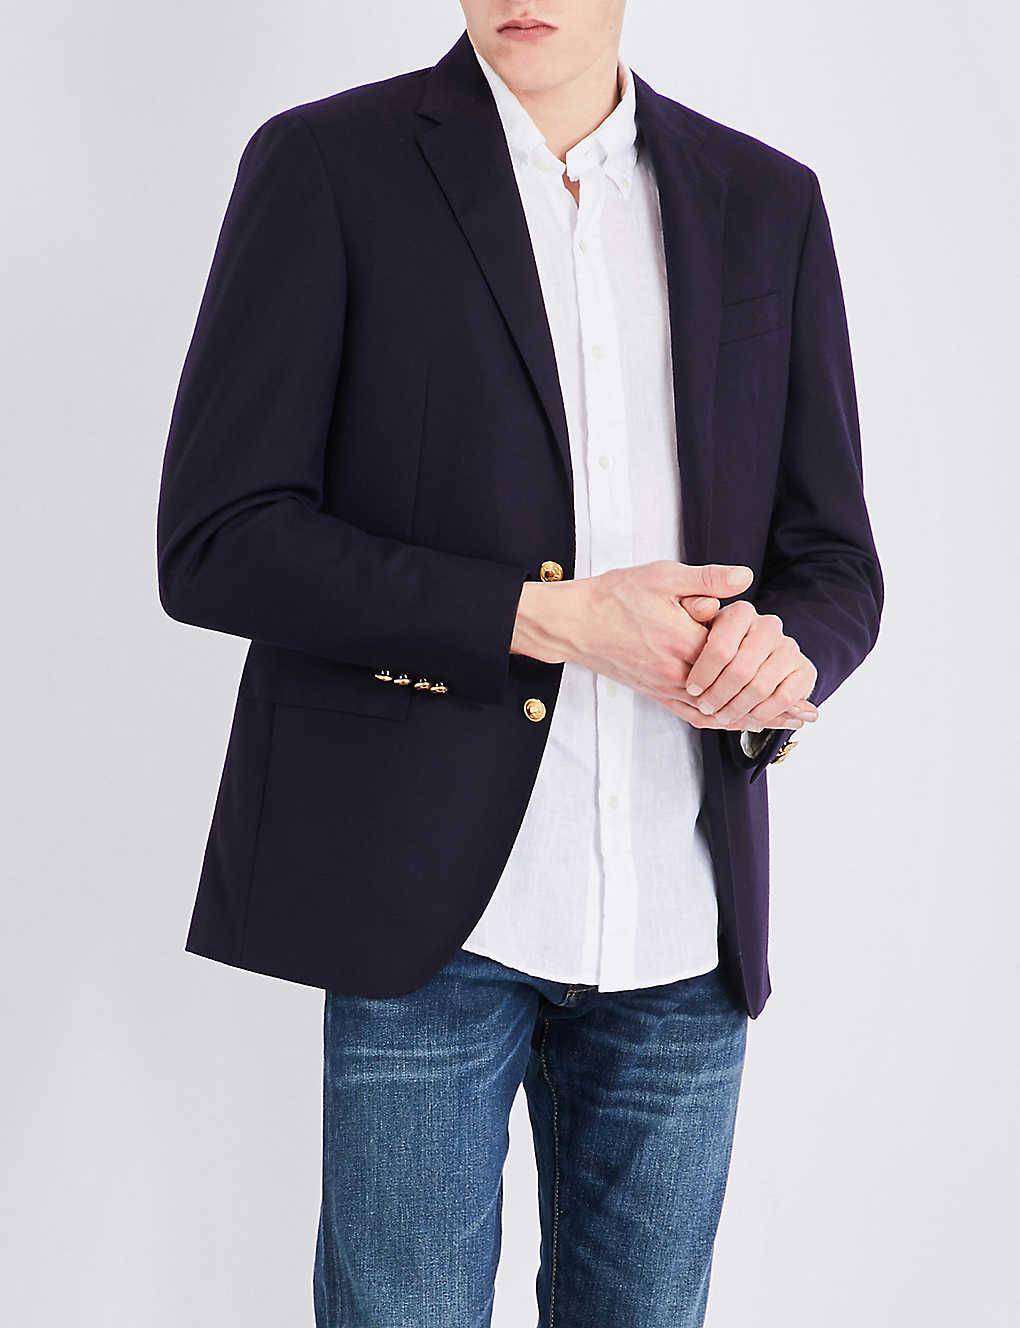 bf0901fdbbbd POLO RALPH LAUREN - Notch-lapel doeskin wool jacket | Selfridges.com